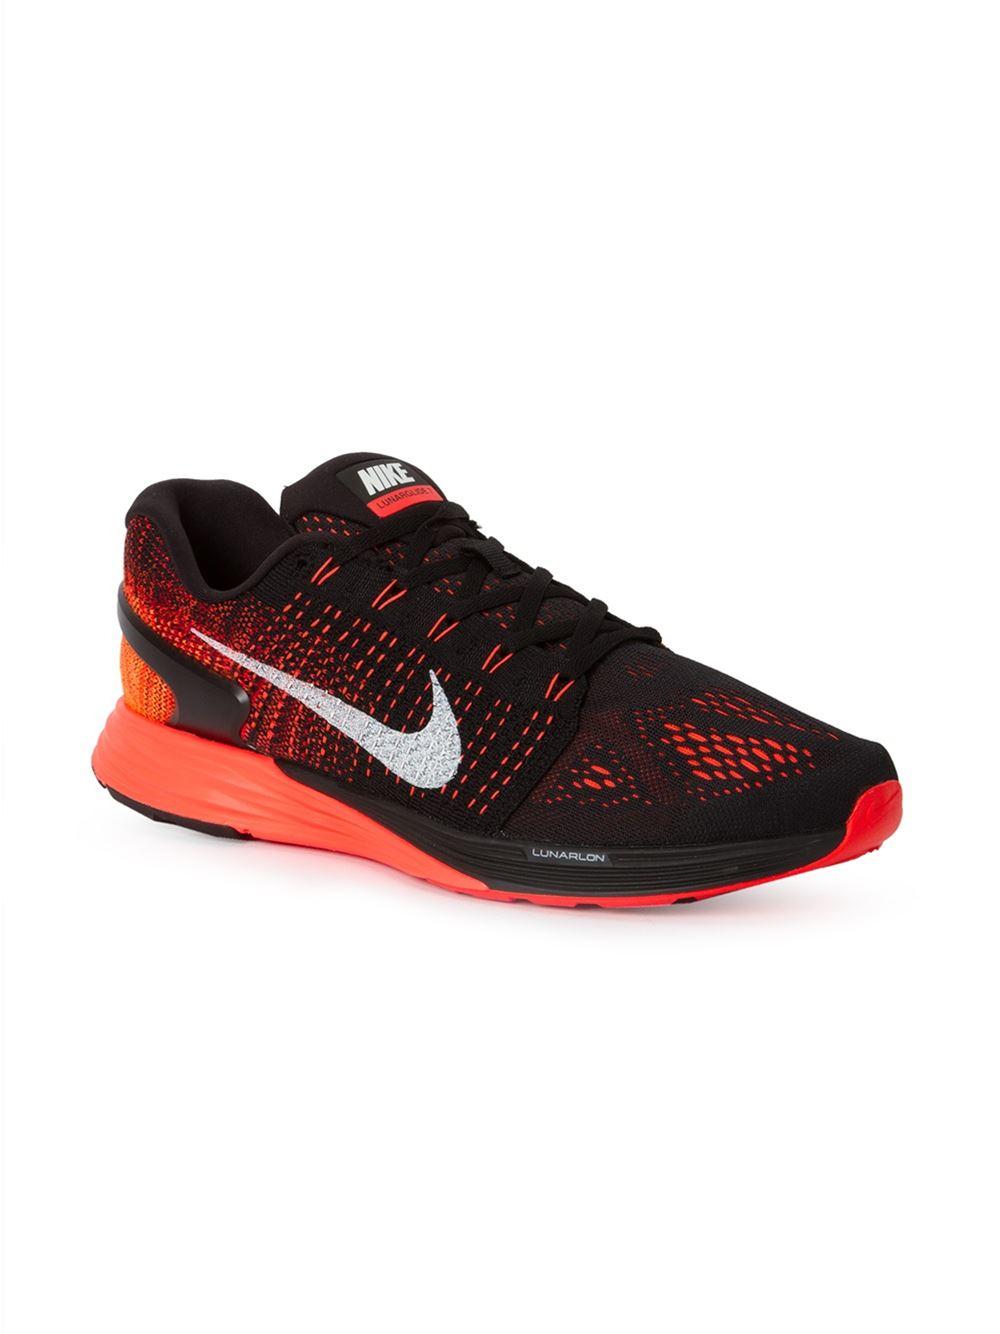 nike lunarglide 7 running sneakers in red for men lyst. Black Bedroom Furniture Sets. Home Design Ideas